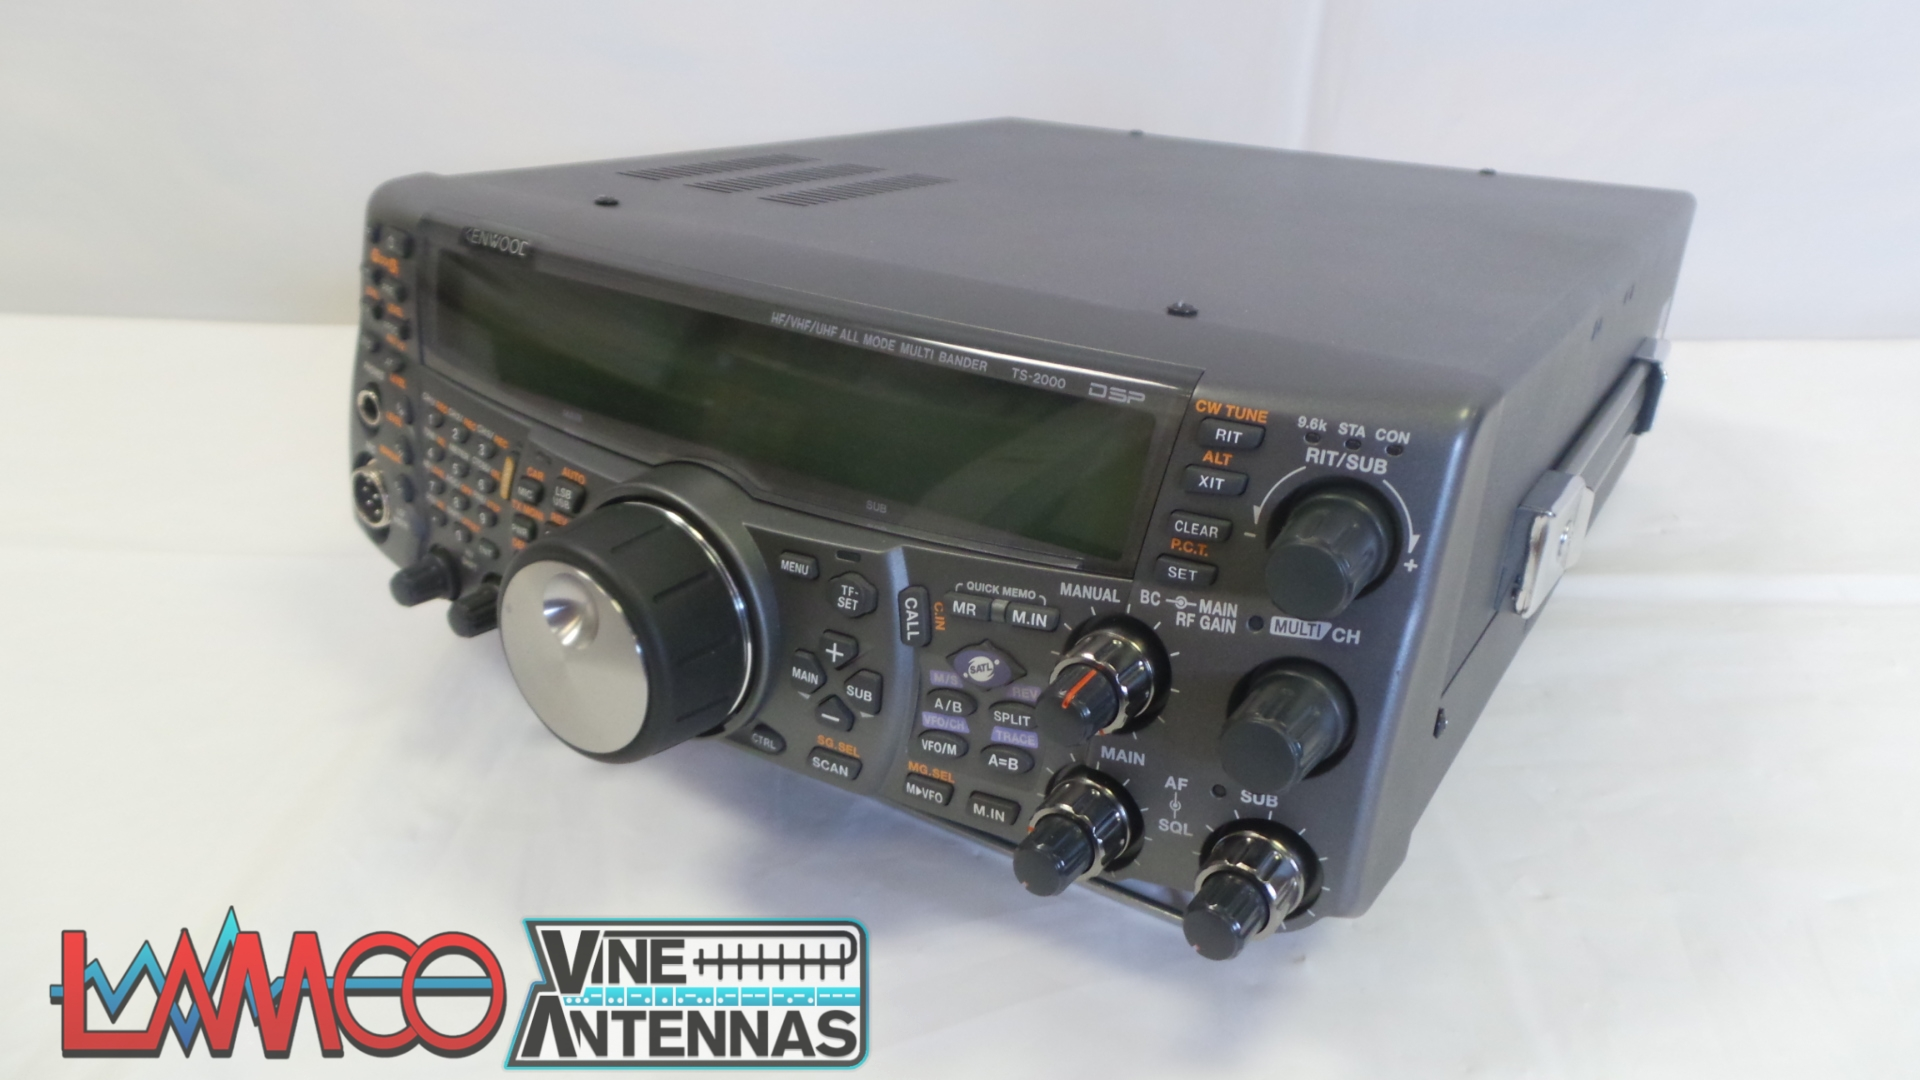 Kenwood TS-2000X inc 23cms USED | 12 Months Warranty | LAMCO Barnsley